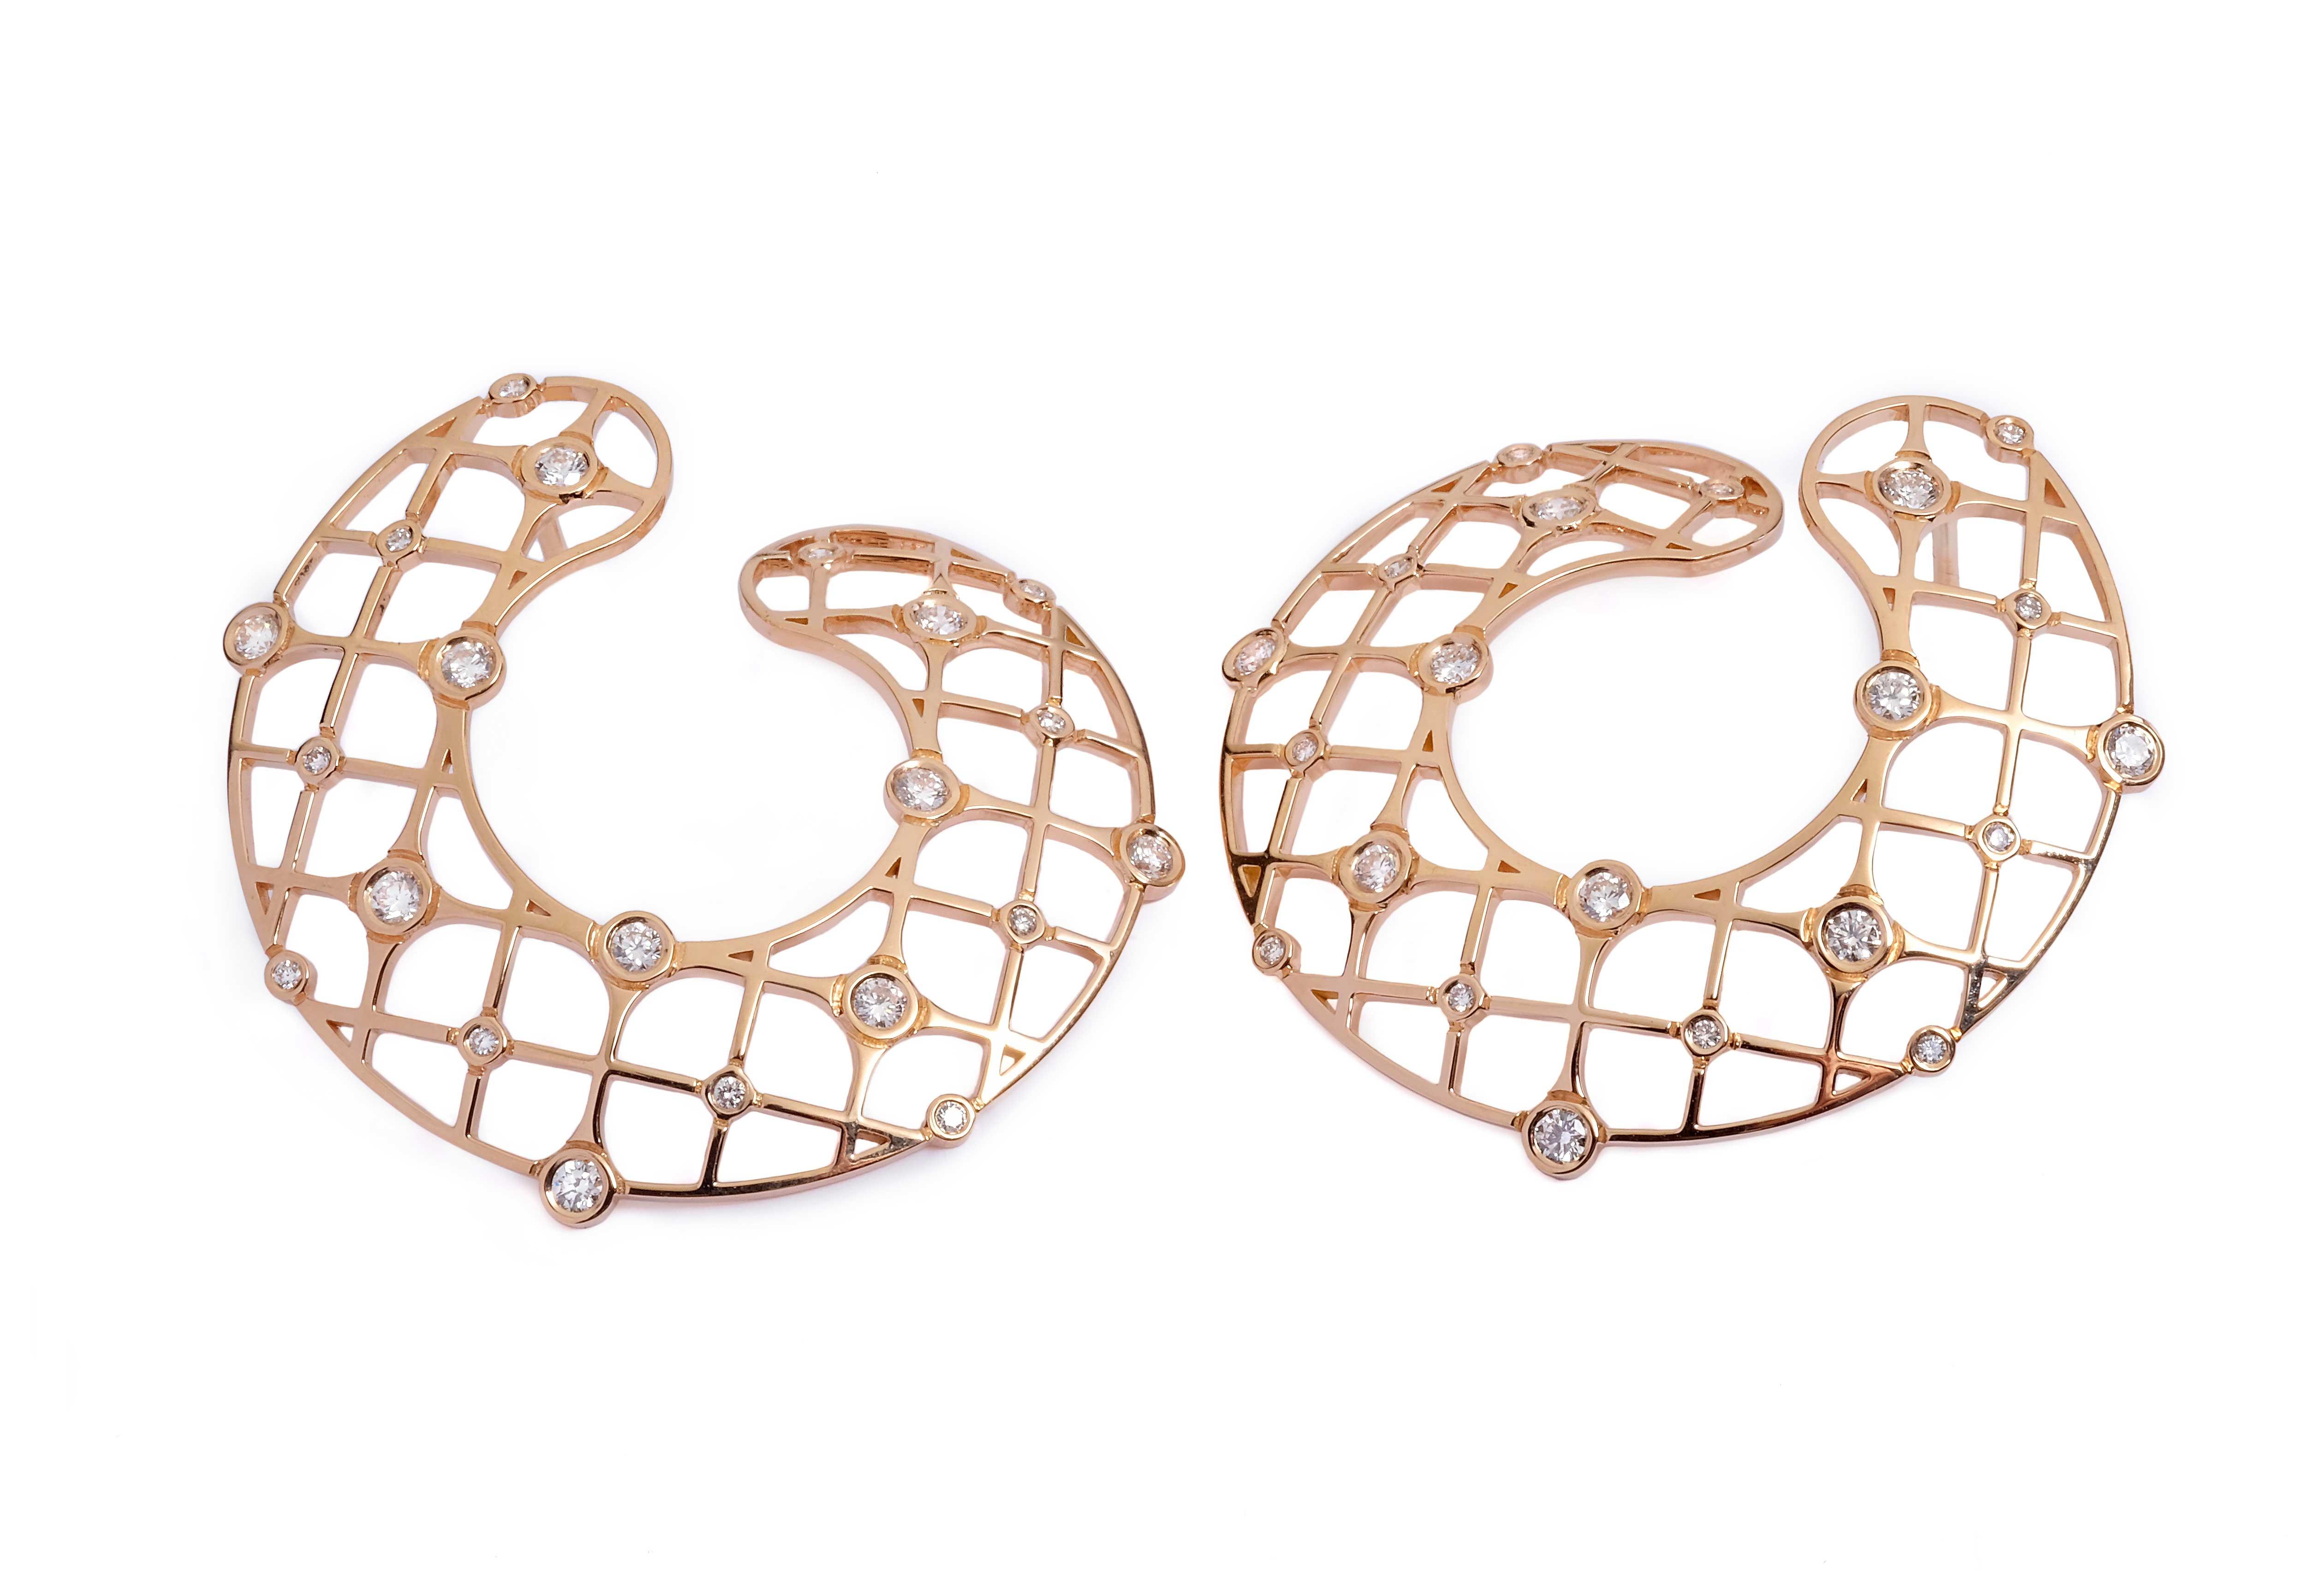 pendientes de oro_ramon jewellers (2)